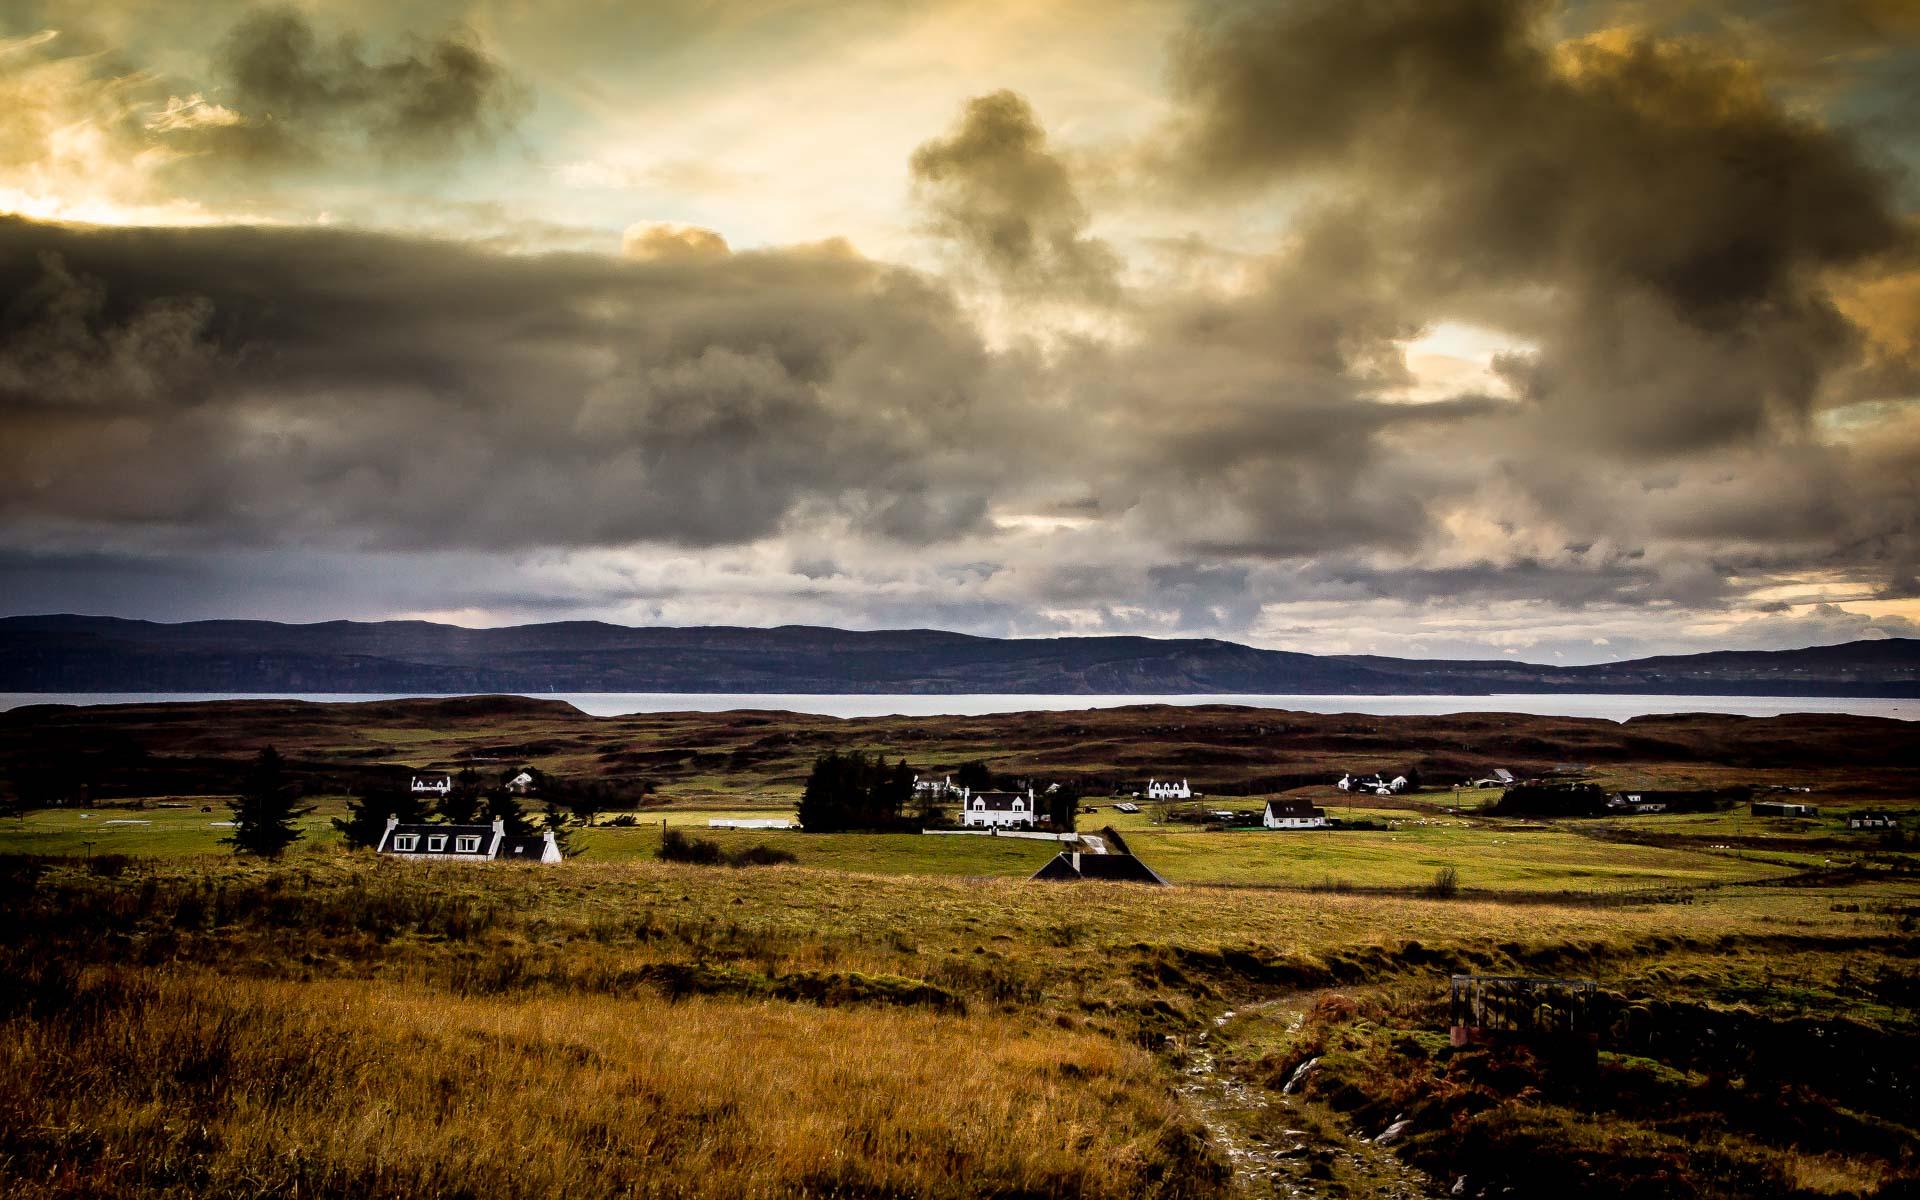 Representing and embracing rural general practice in Scotland